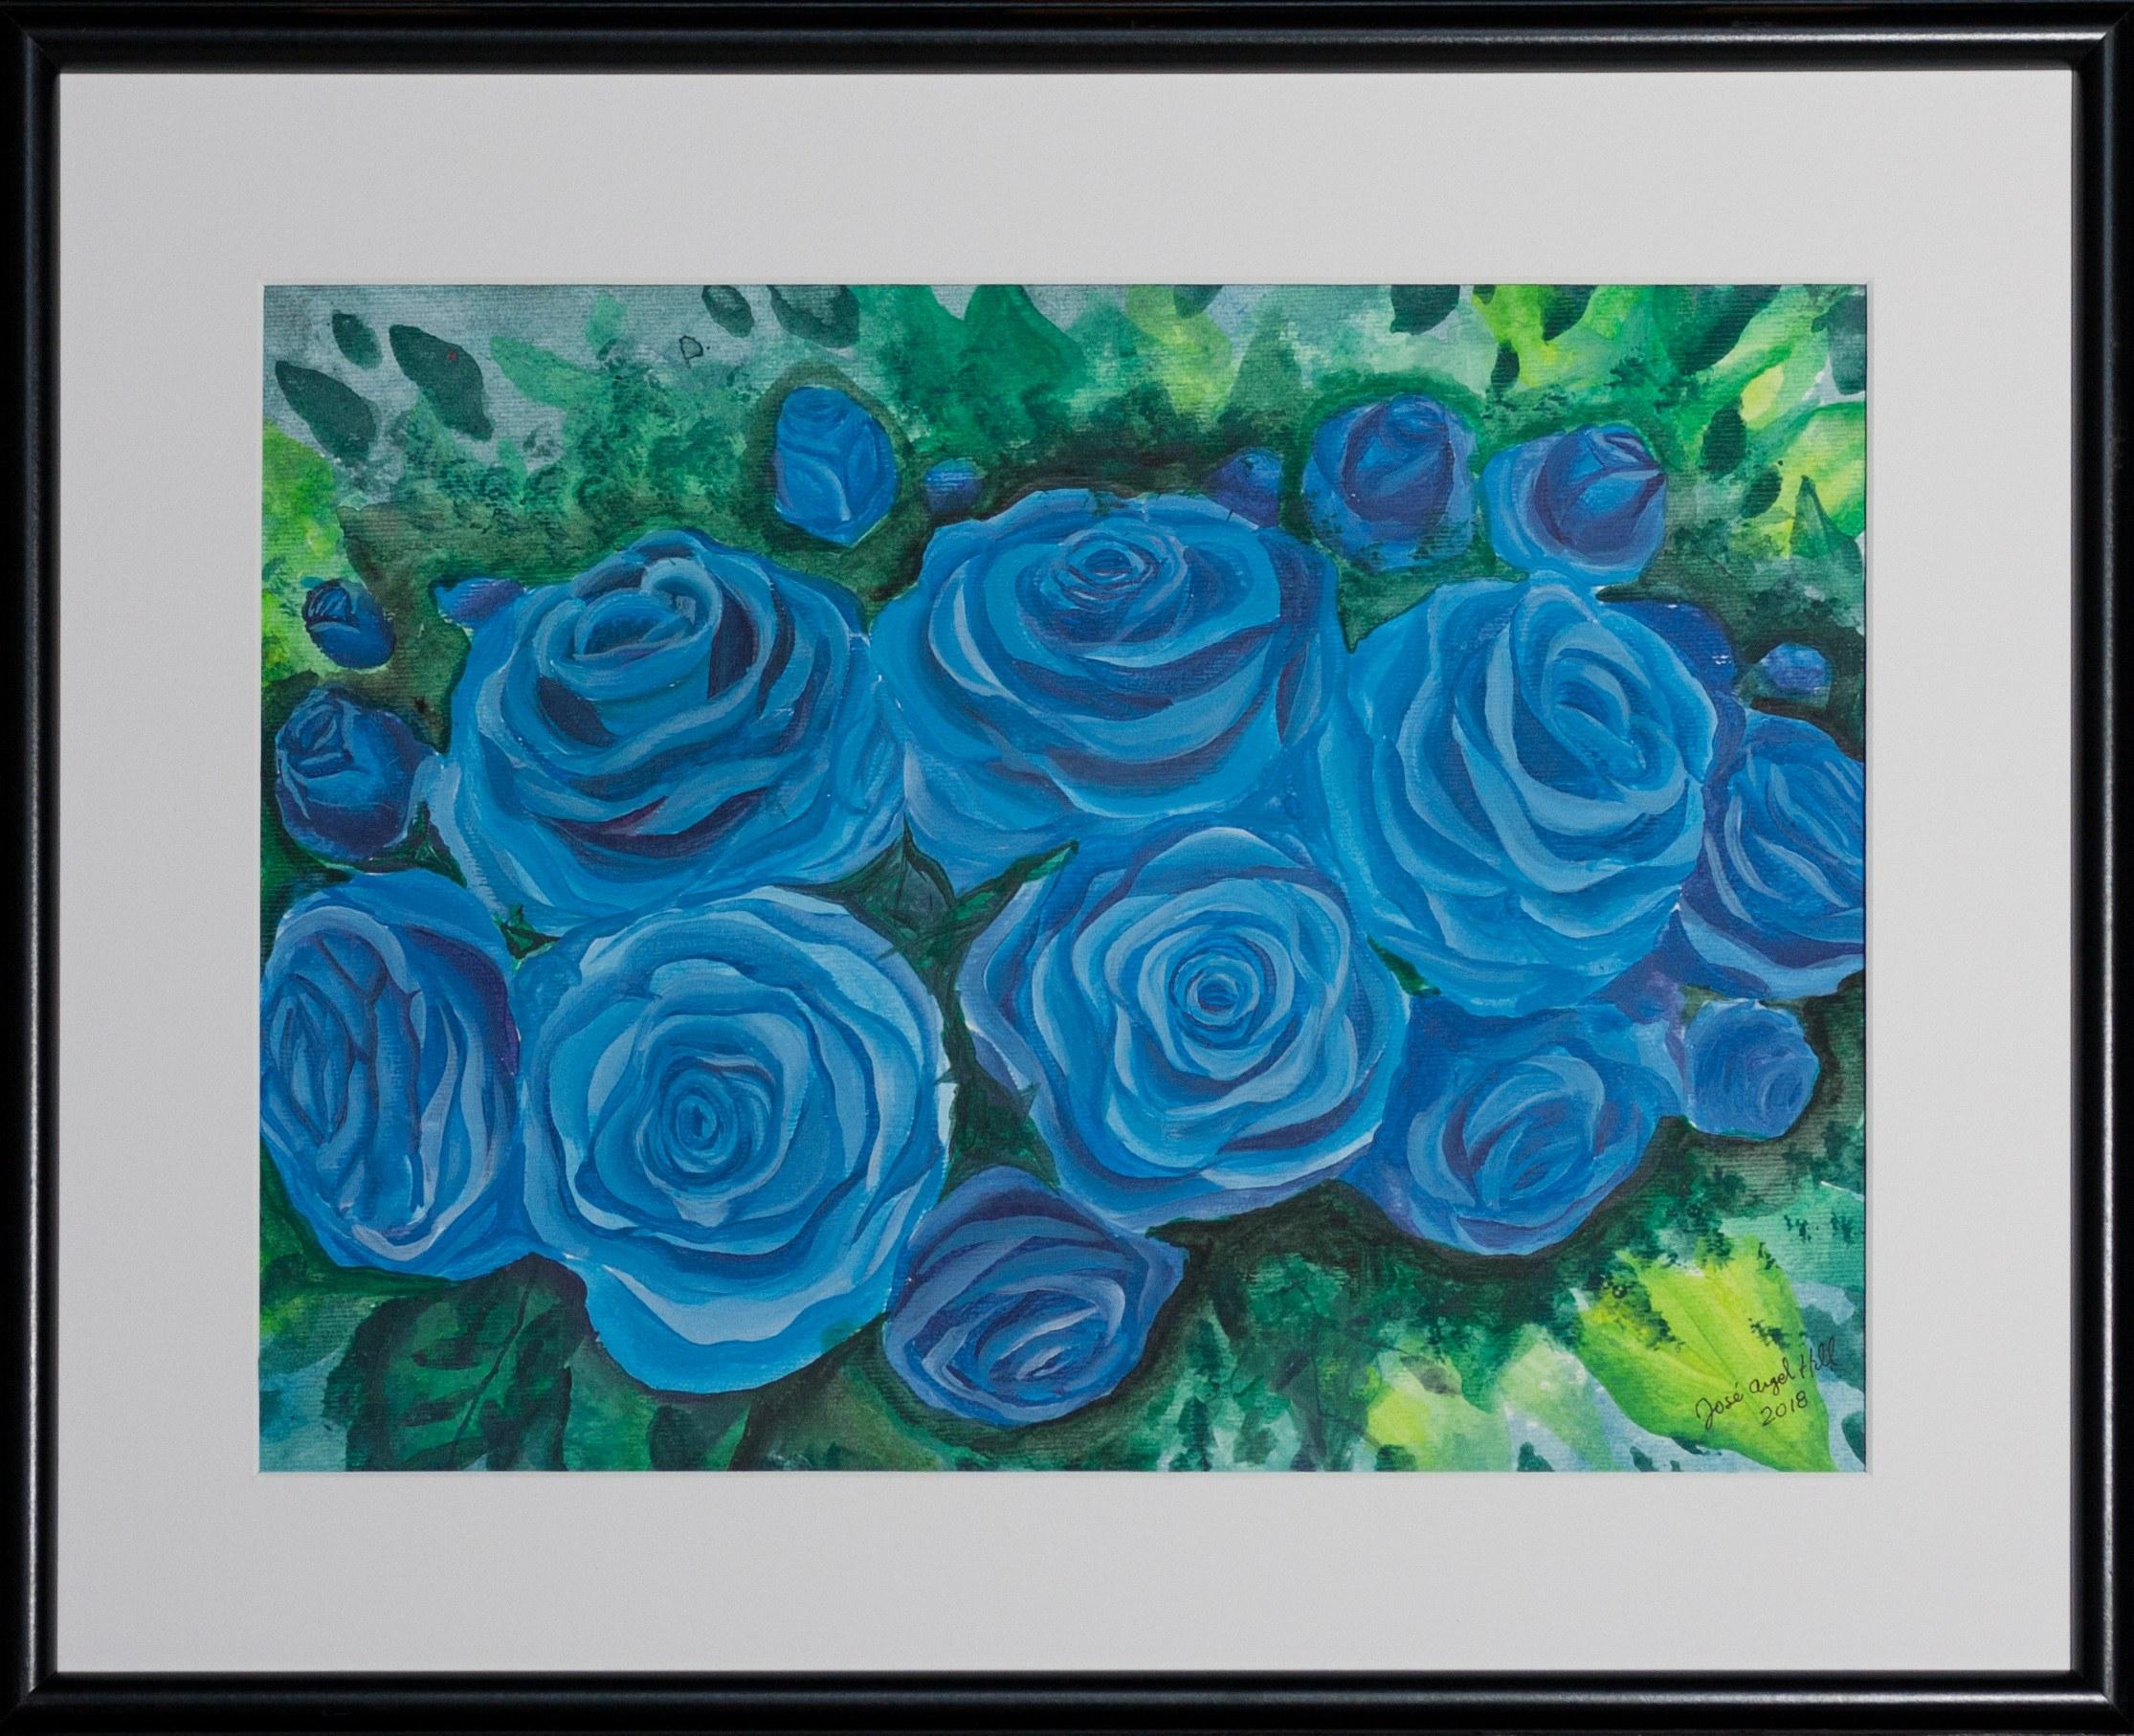 José Angel Hill, Blue roses